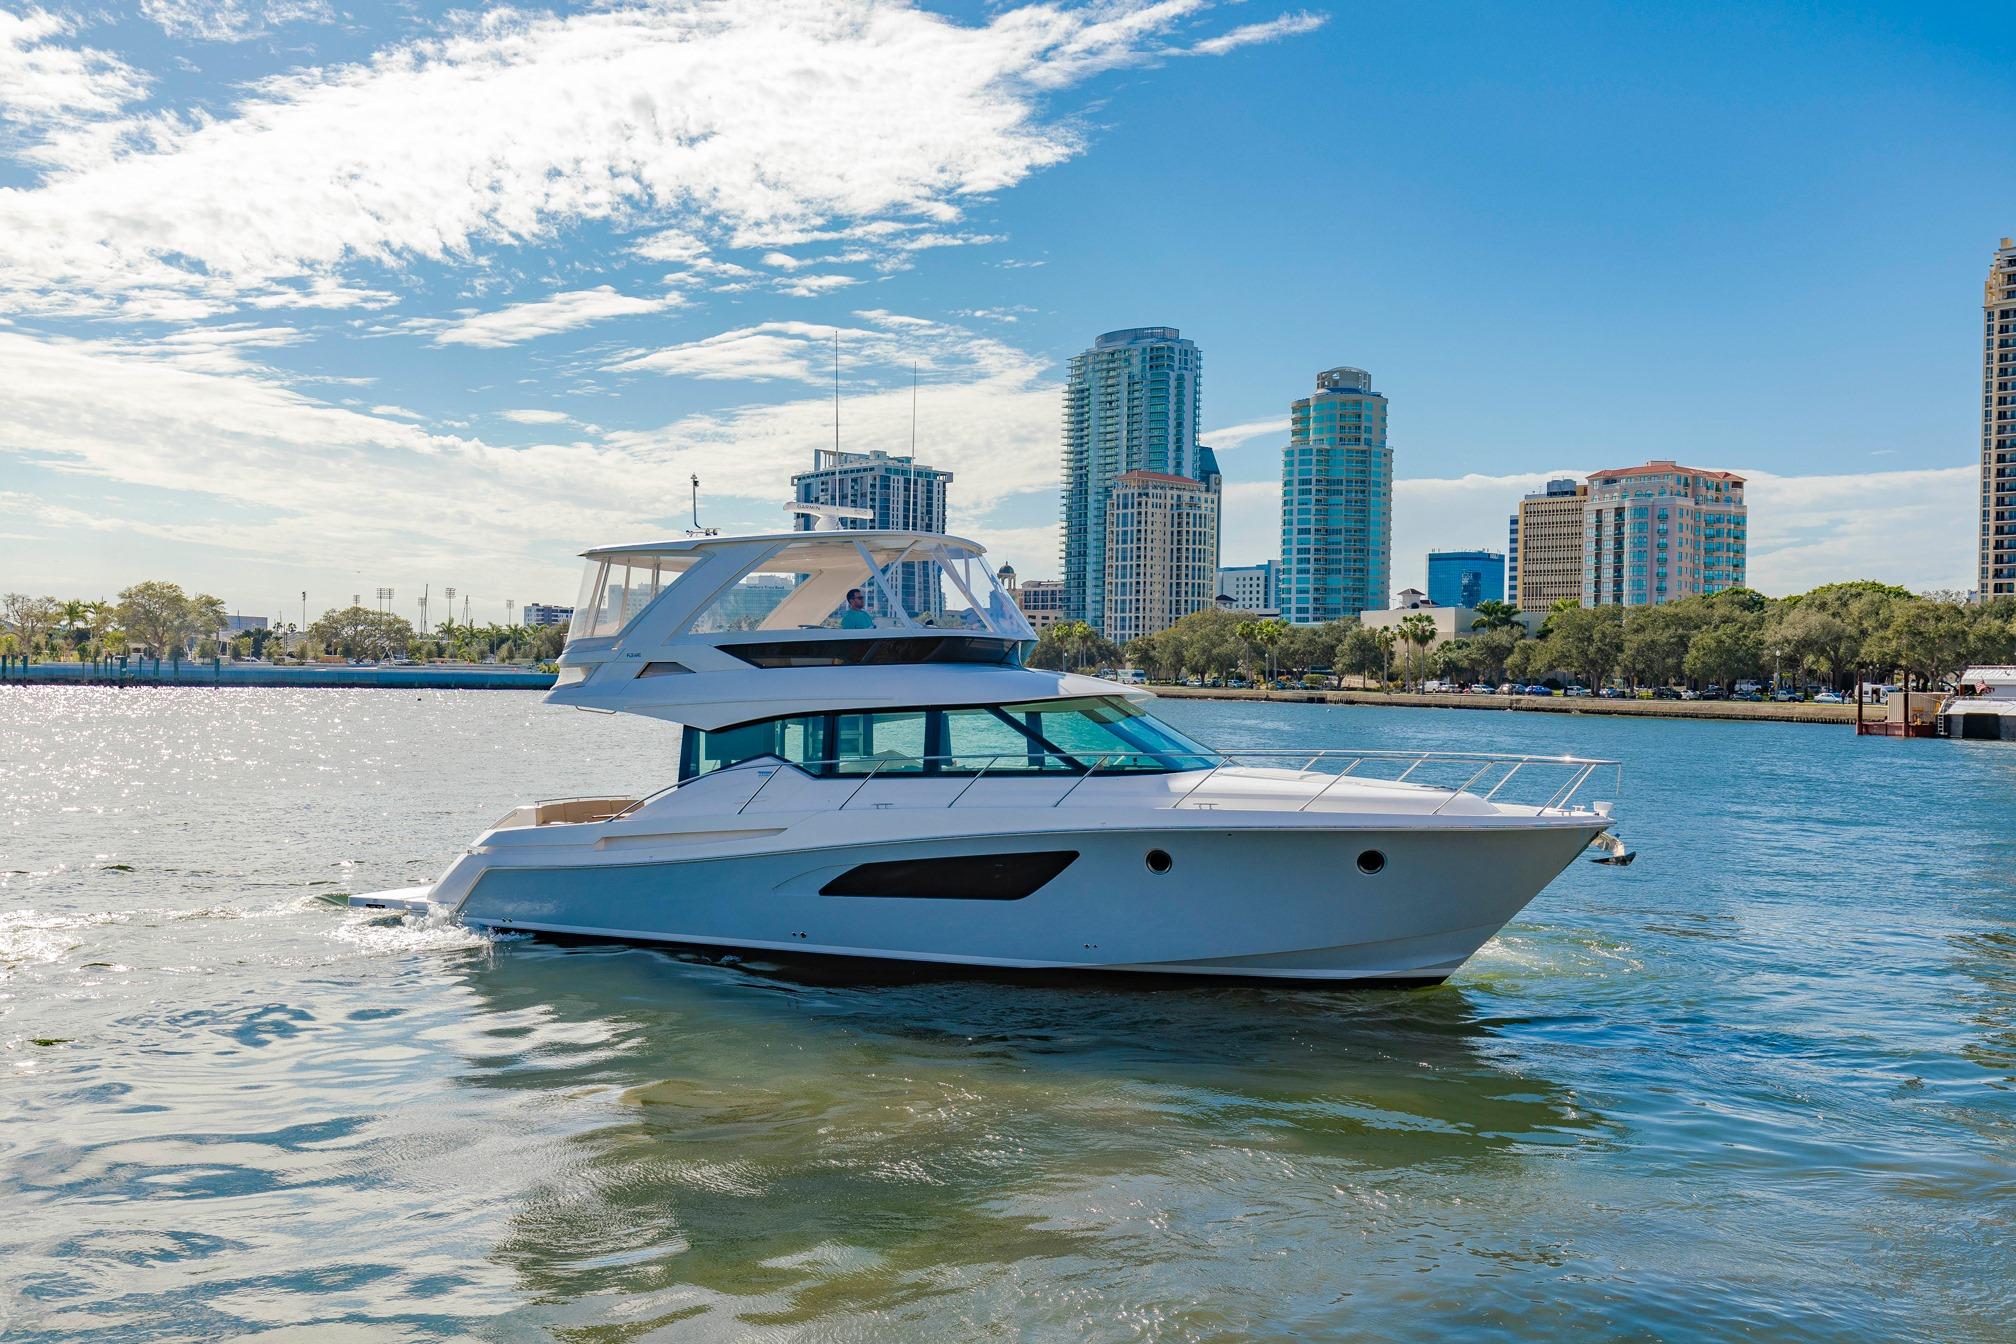 "2017 Tiara Yachts F53 Flybridge ""Fiji Kai"" — Sold by HMY Yacht Sales"